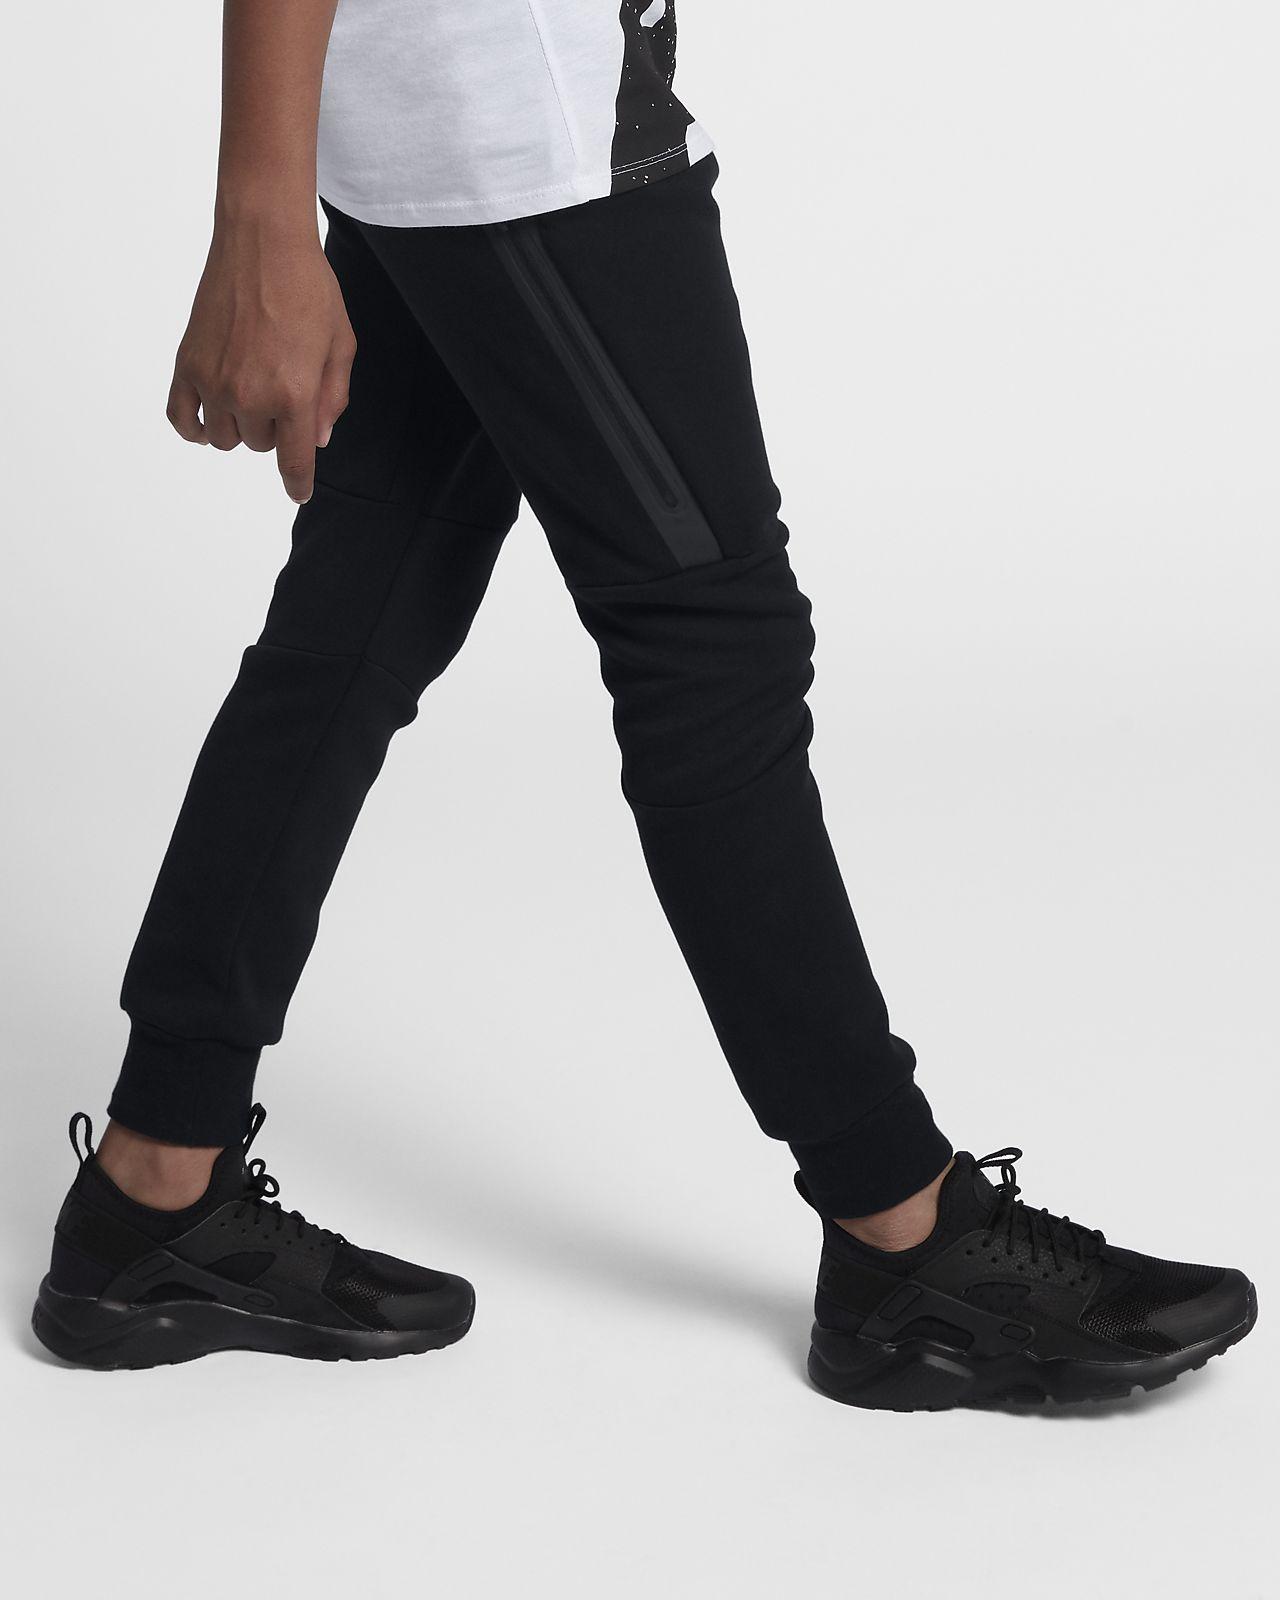 2a3b02f0f Nike Sportswear Pantalón Tech Fleece - Niño/a. Nike.com ES